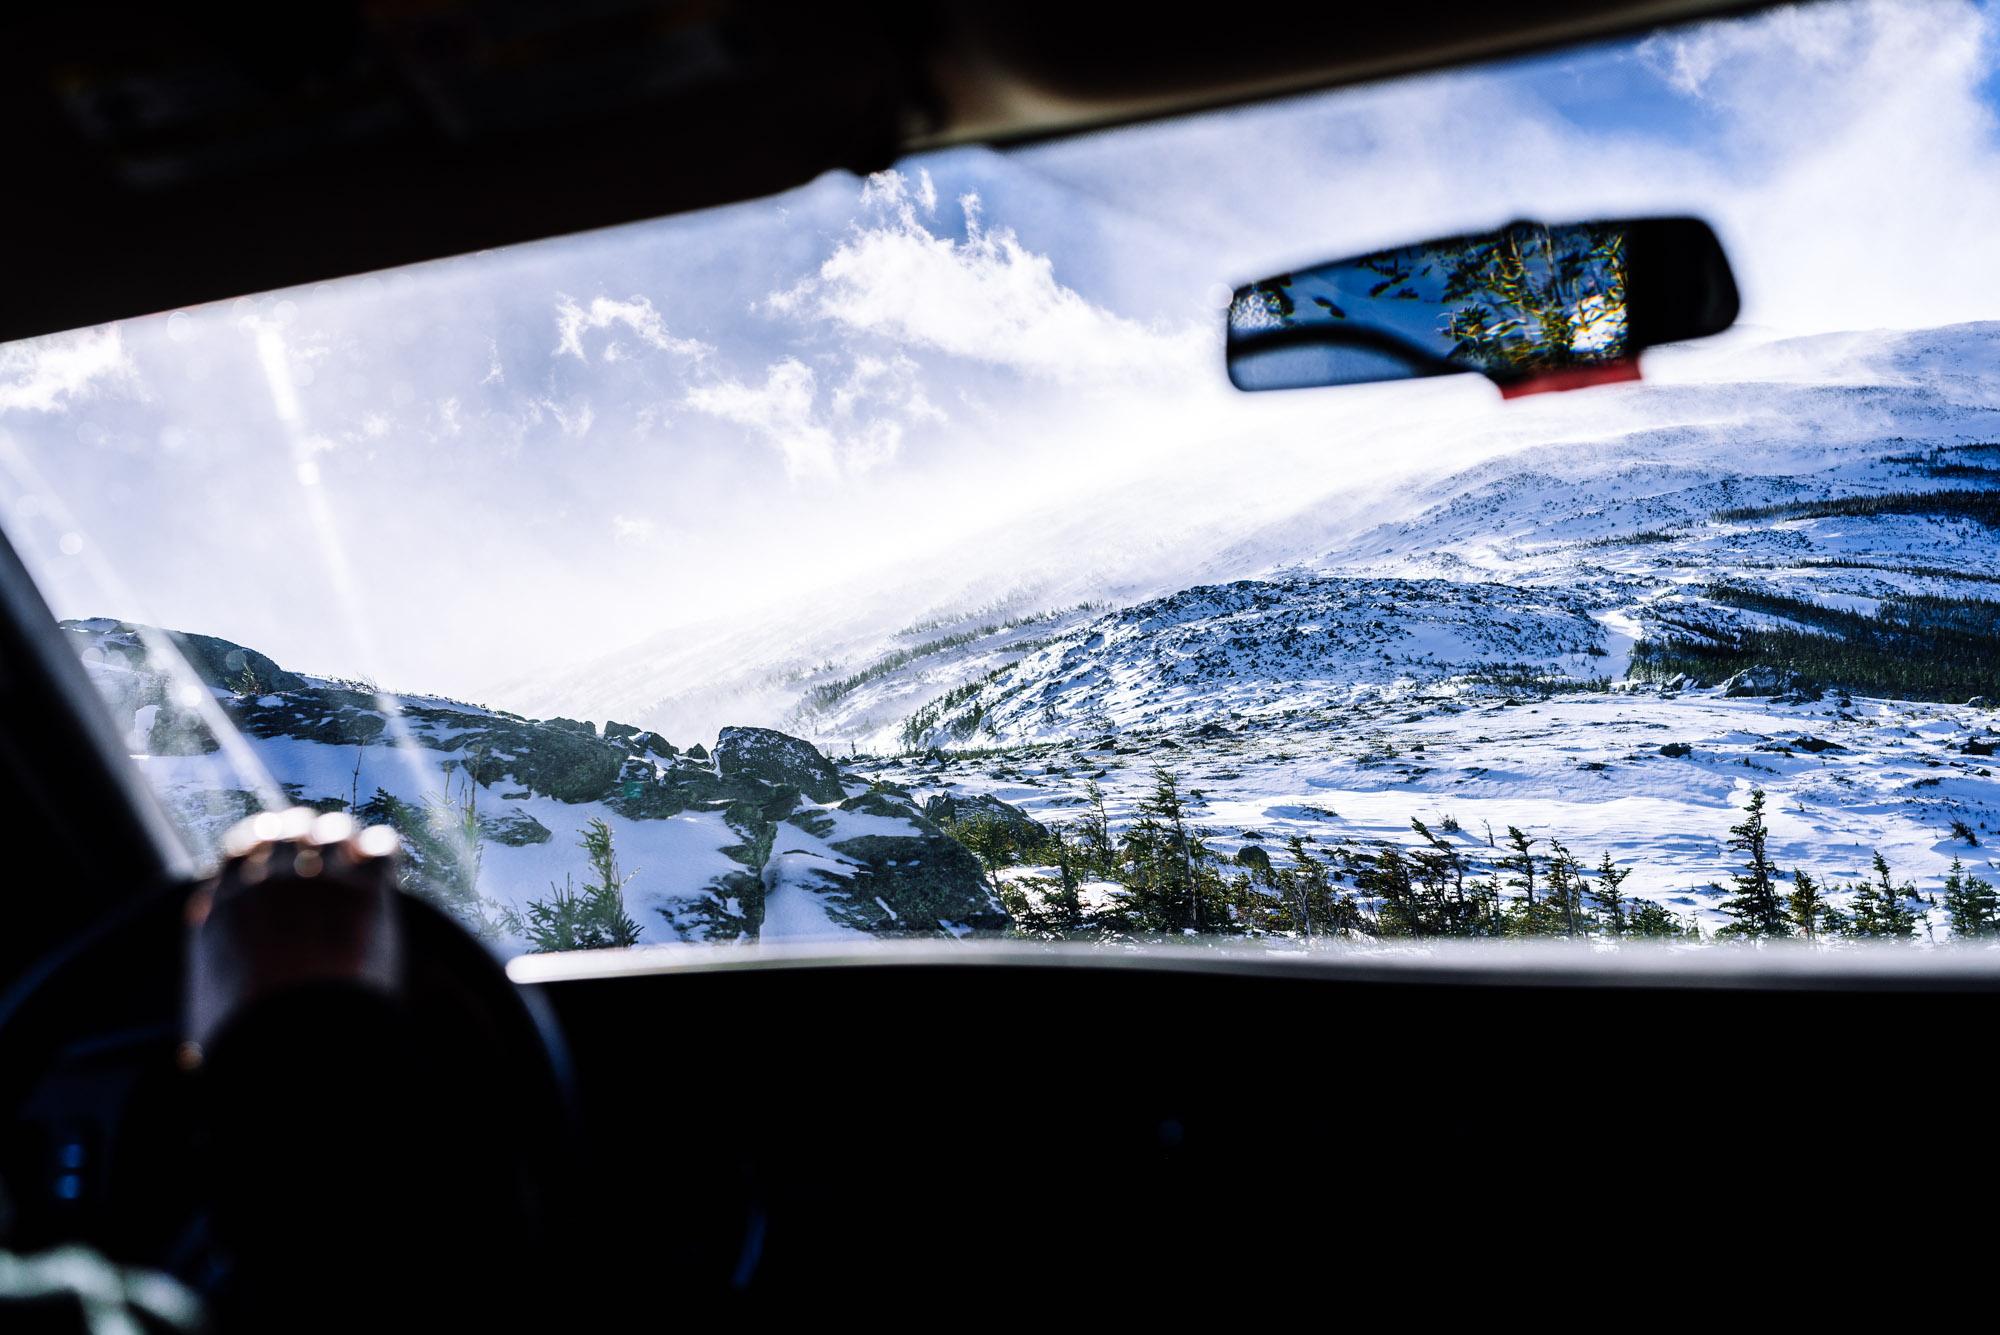 jeffontheroad-travel-new-hampshire-mount-washington-snowcoach-5.JPG